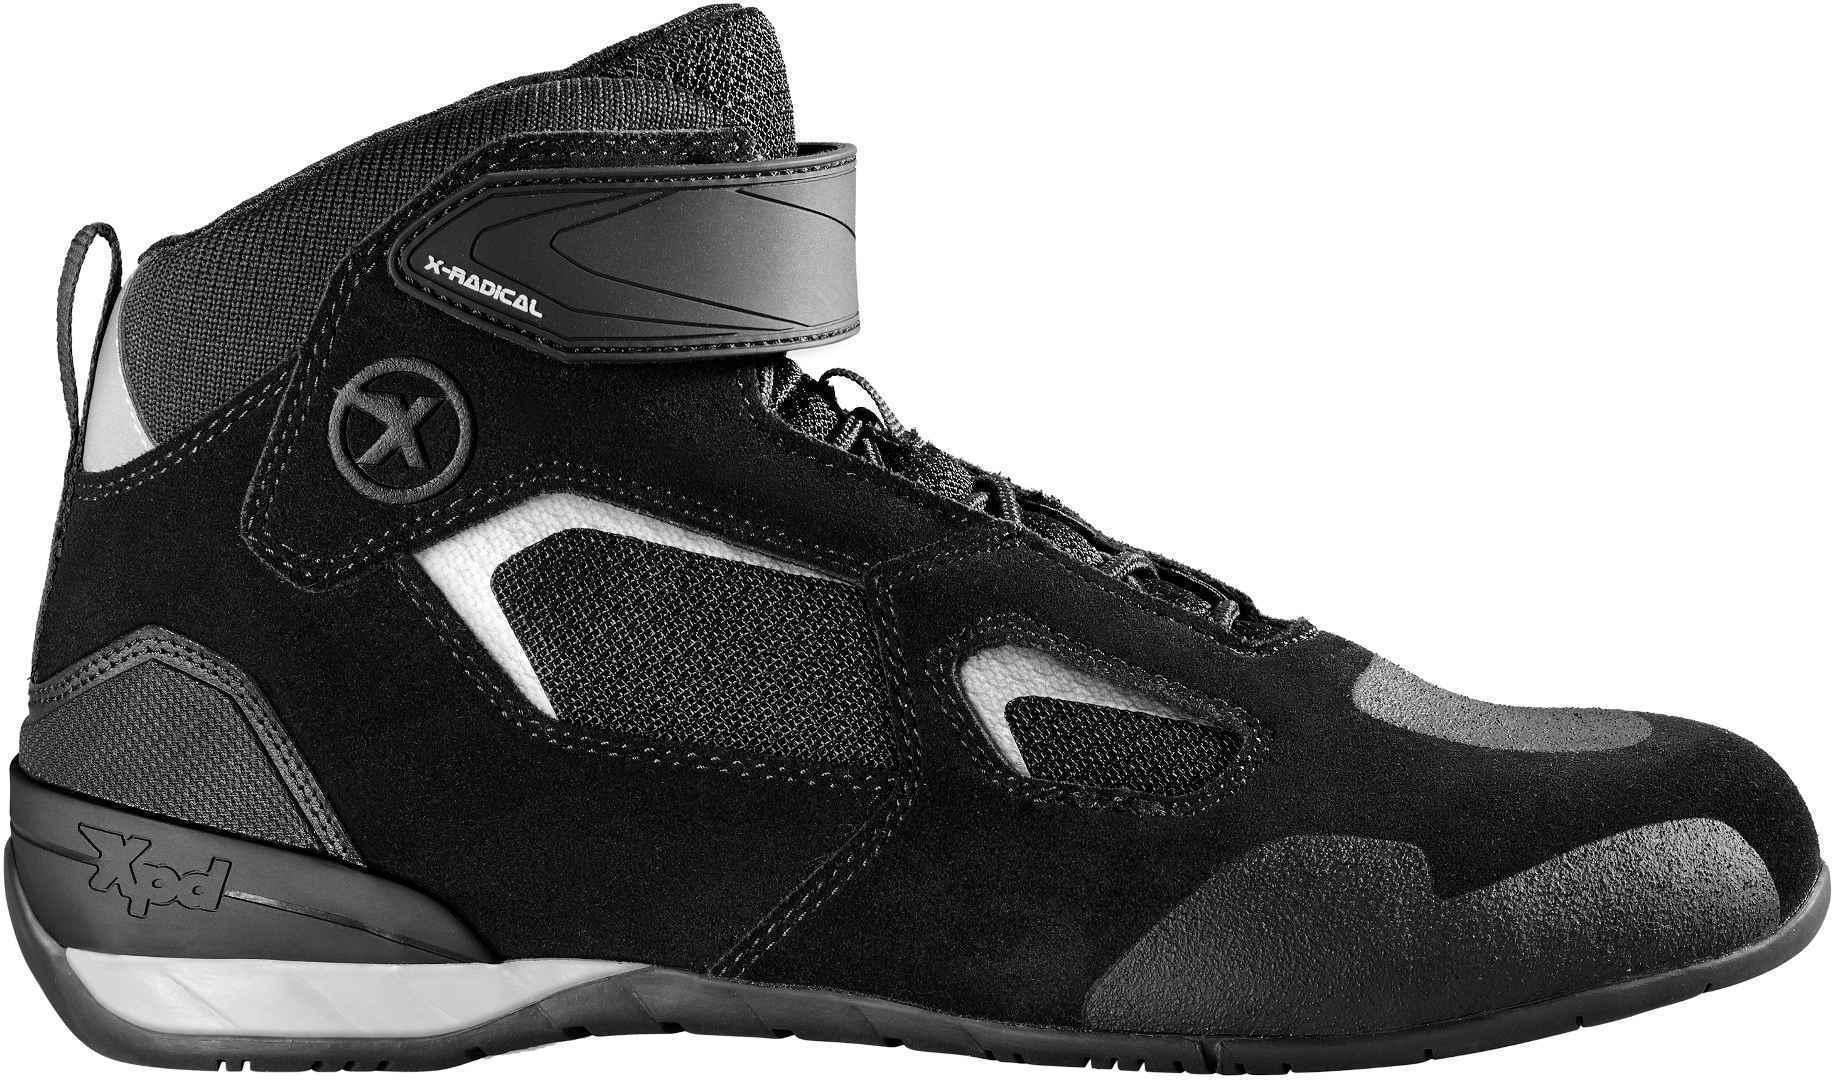 XPD X-Radical Motorrad Schuhe, schwarz-grau, Größe 44, schwarz-grau, Größe 44